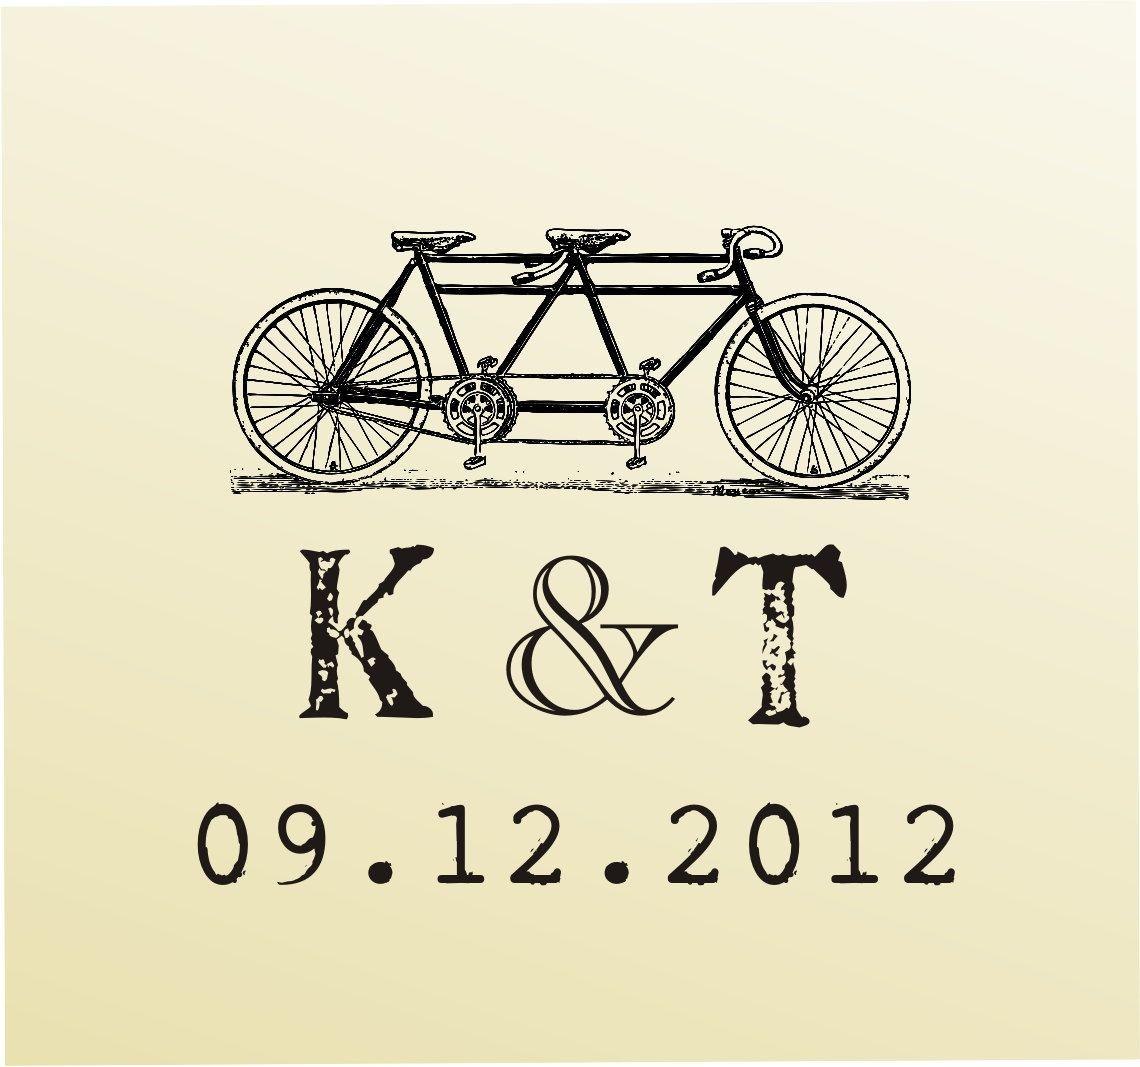 Vintage MONOGRAM Bike design typewriter font rubber stamp clear ...